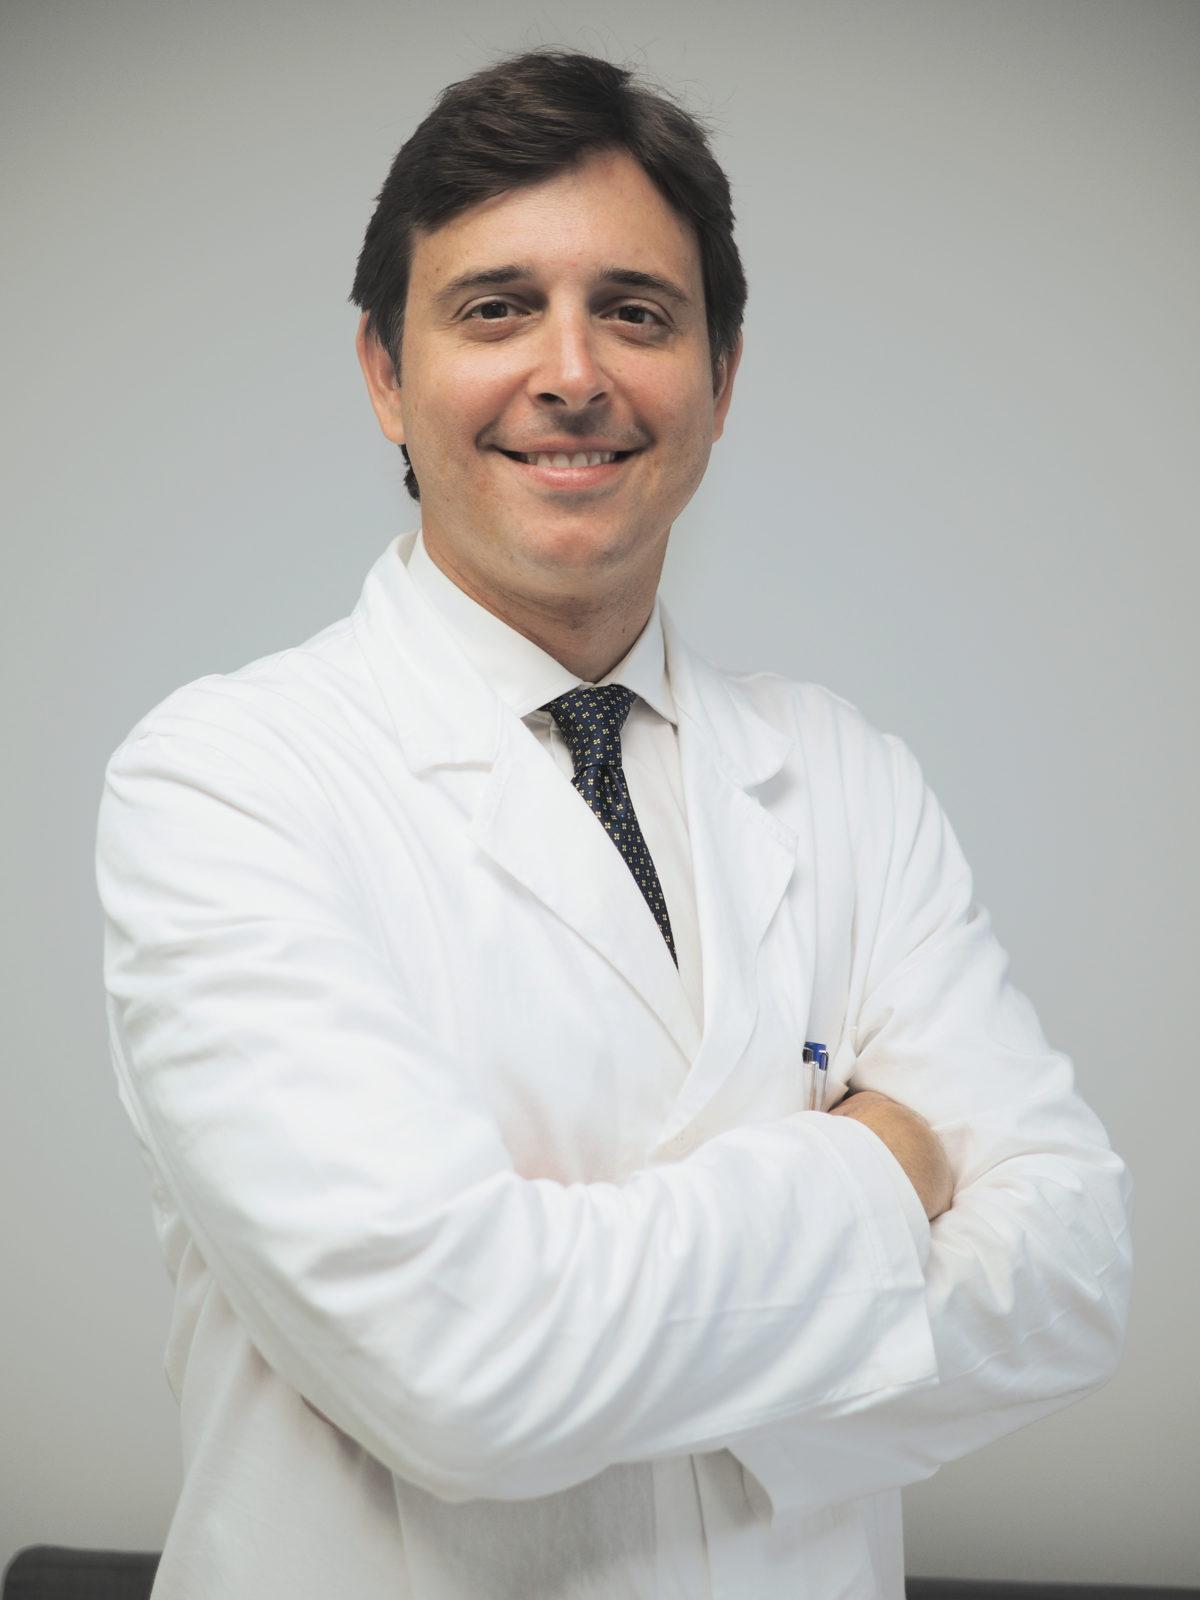 ff3d59367c Direttore Sanitario - Felipe Sanz - Oculista Cagliari